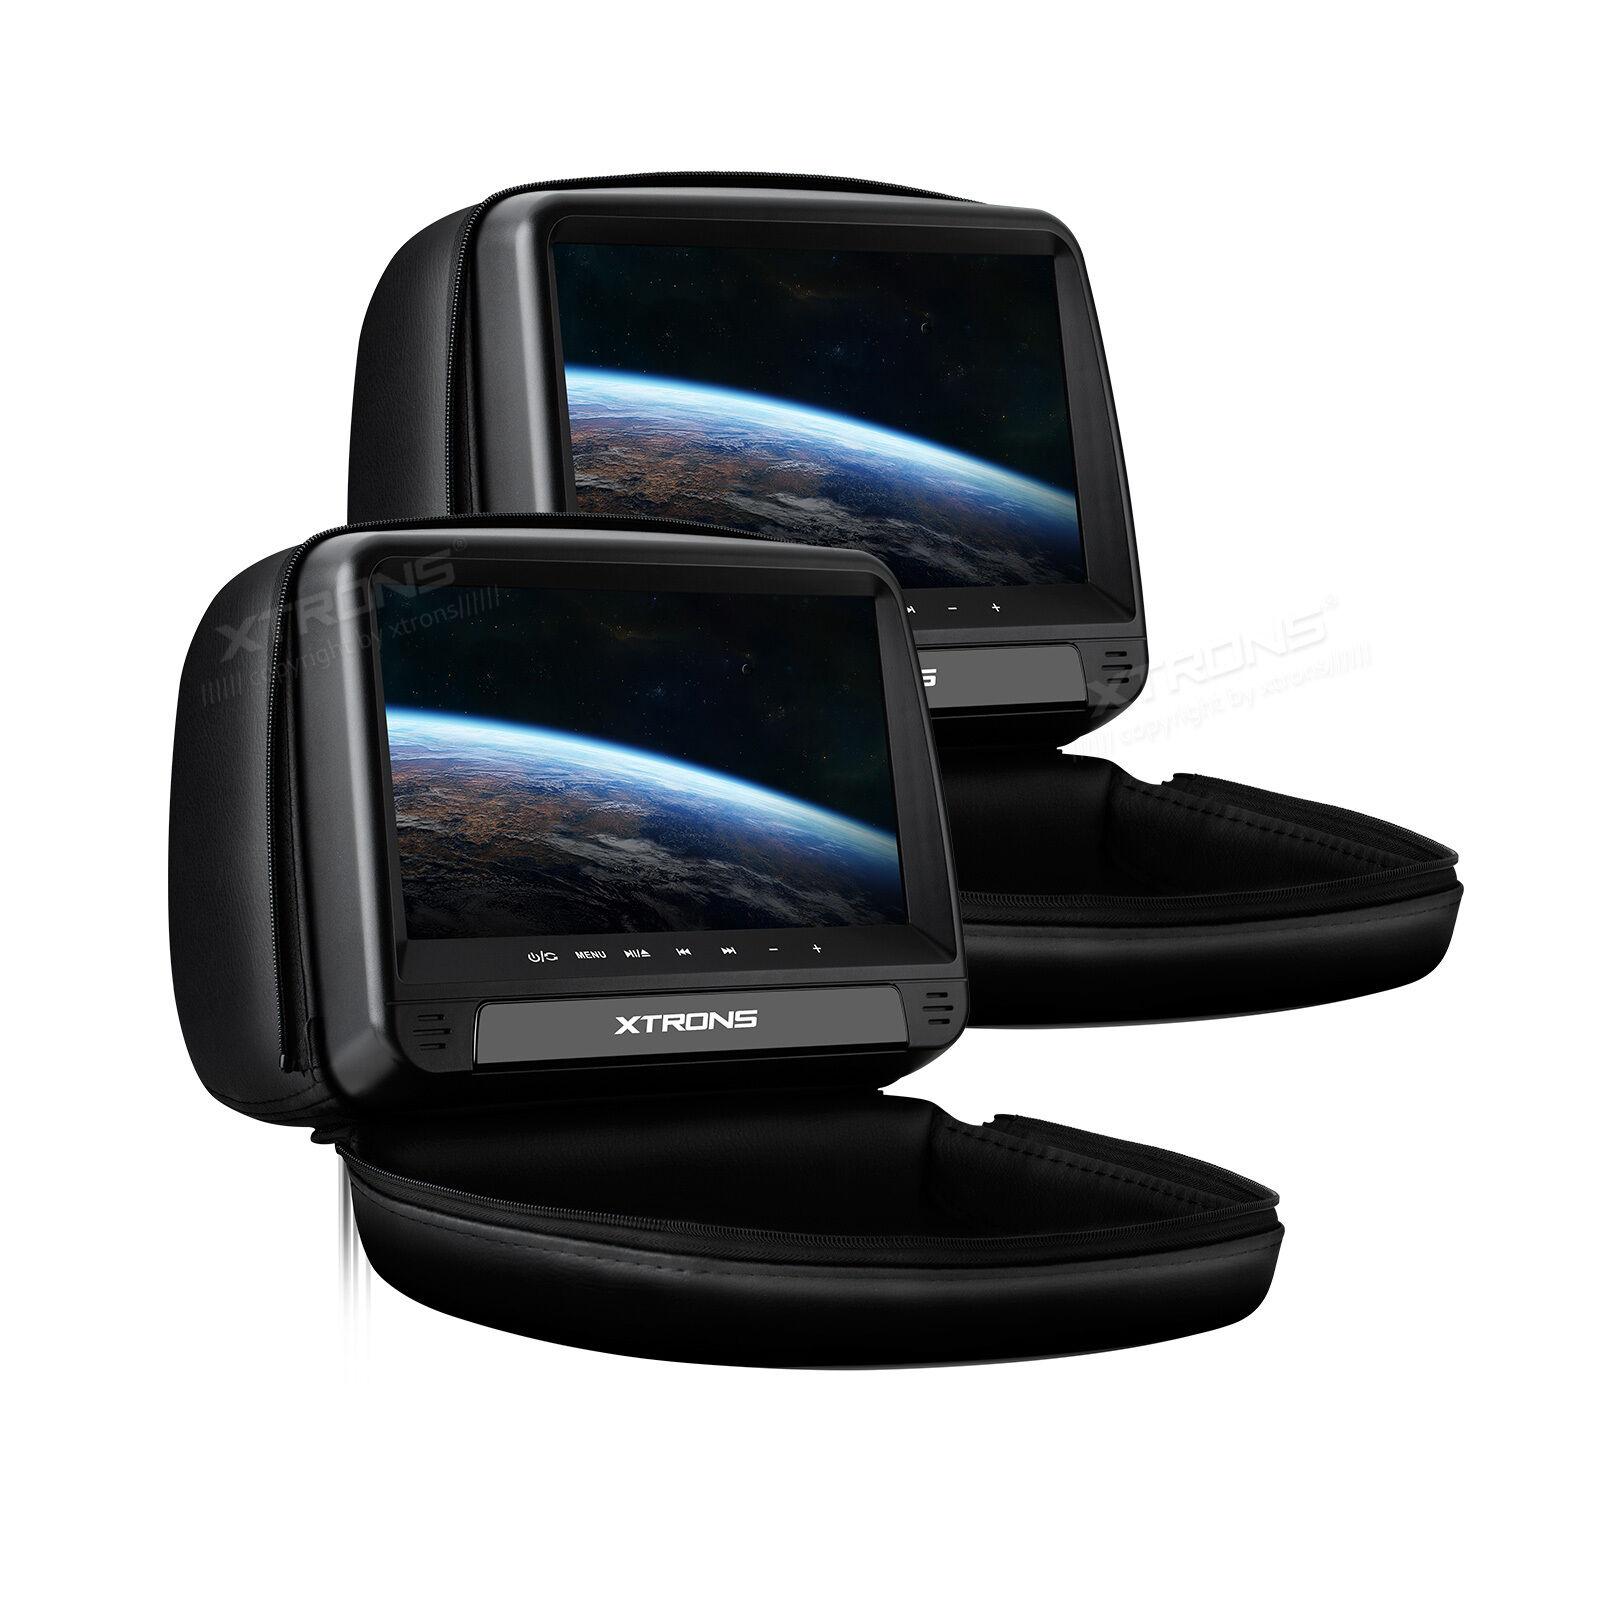 2x 10 1 zoll auto kopfst tze monitor dvd player. Black Bedroom Furniture Sets. Home Design Ideas